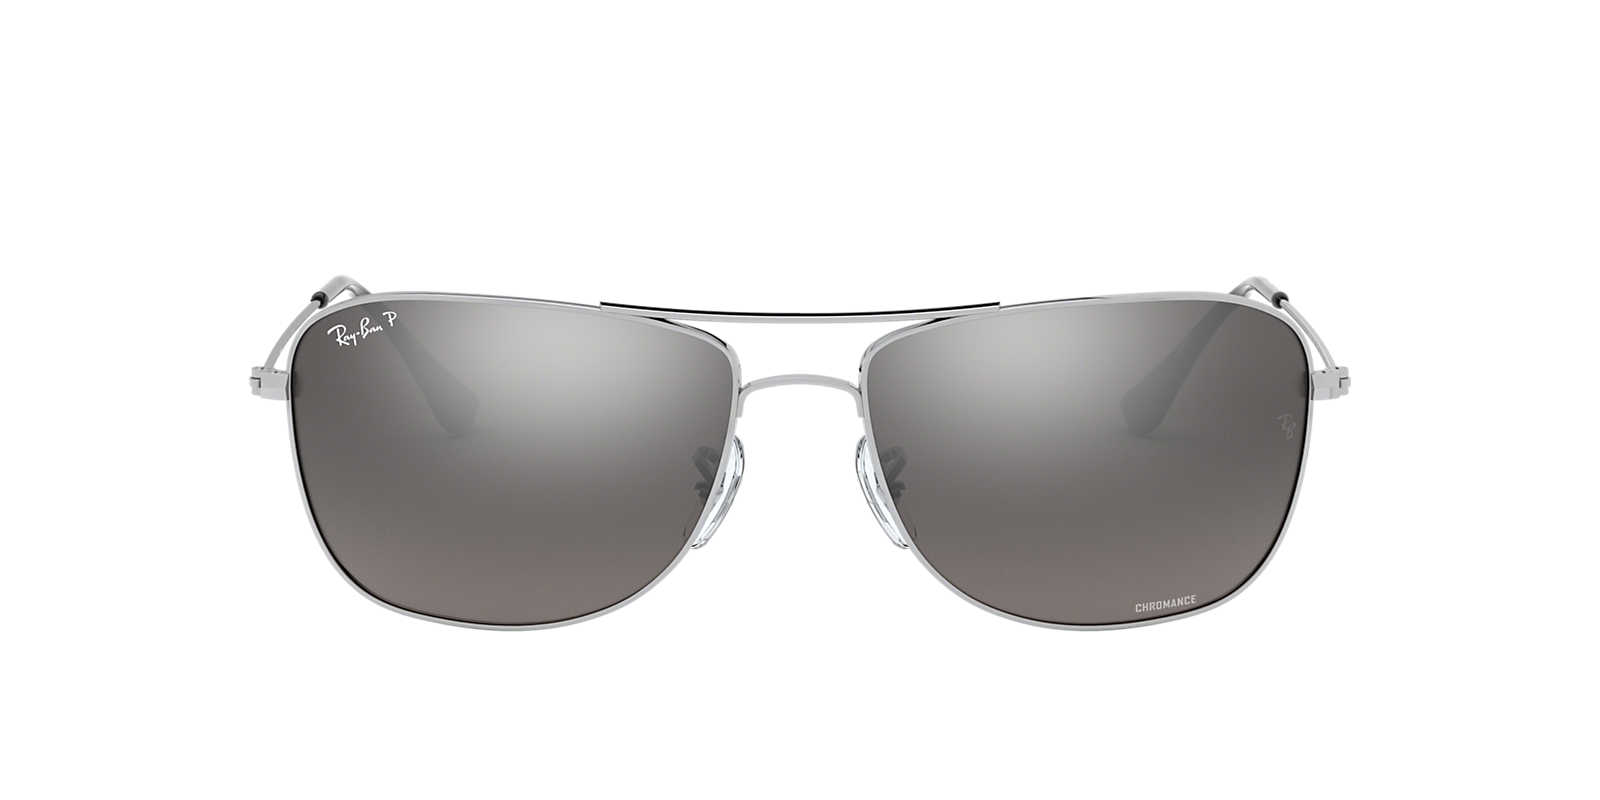 Ray ban sunglasses sale new zealand - Ray Ban